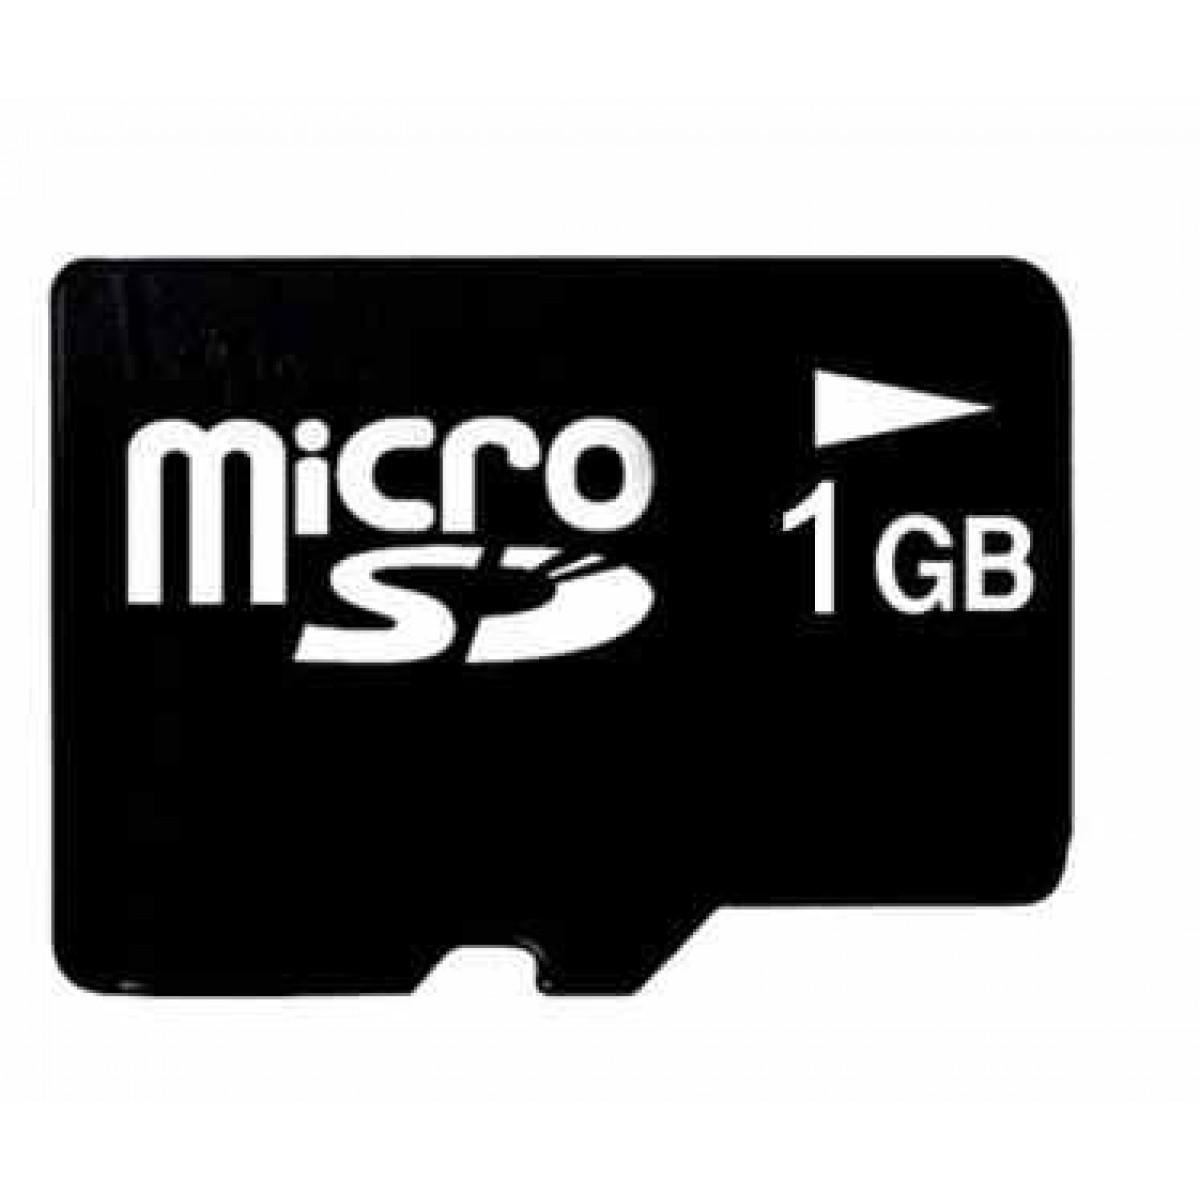 Micro SD Card 1GB